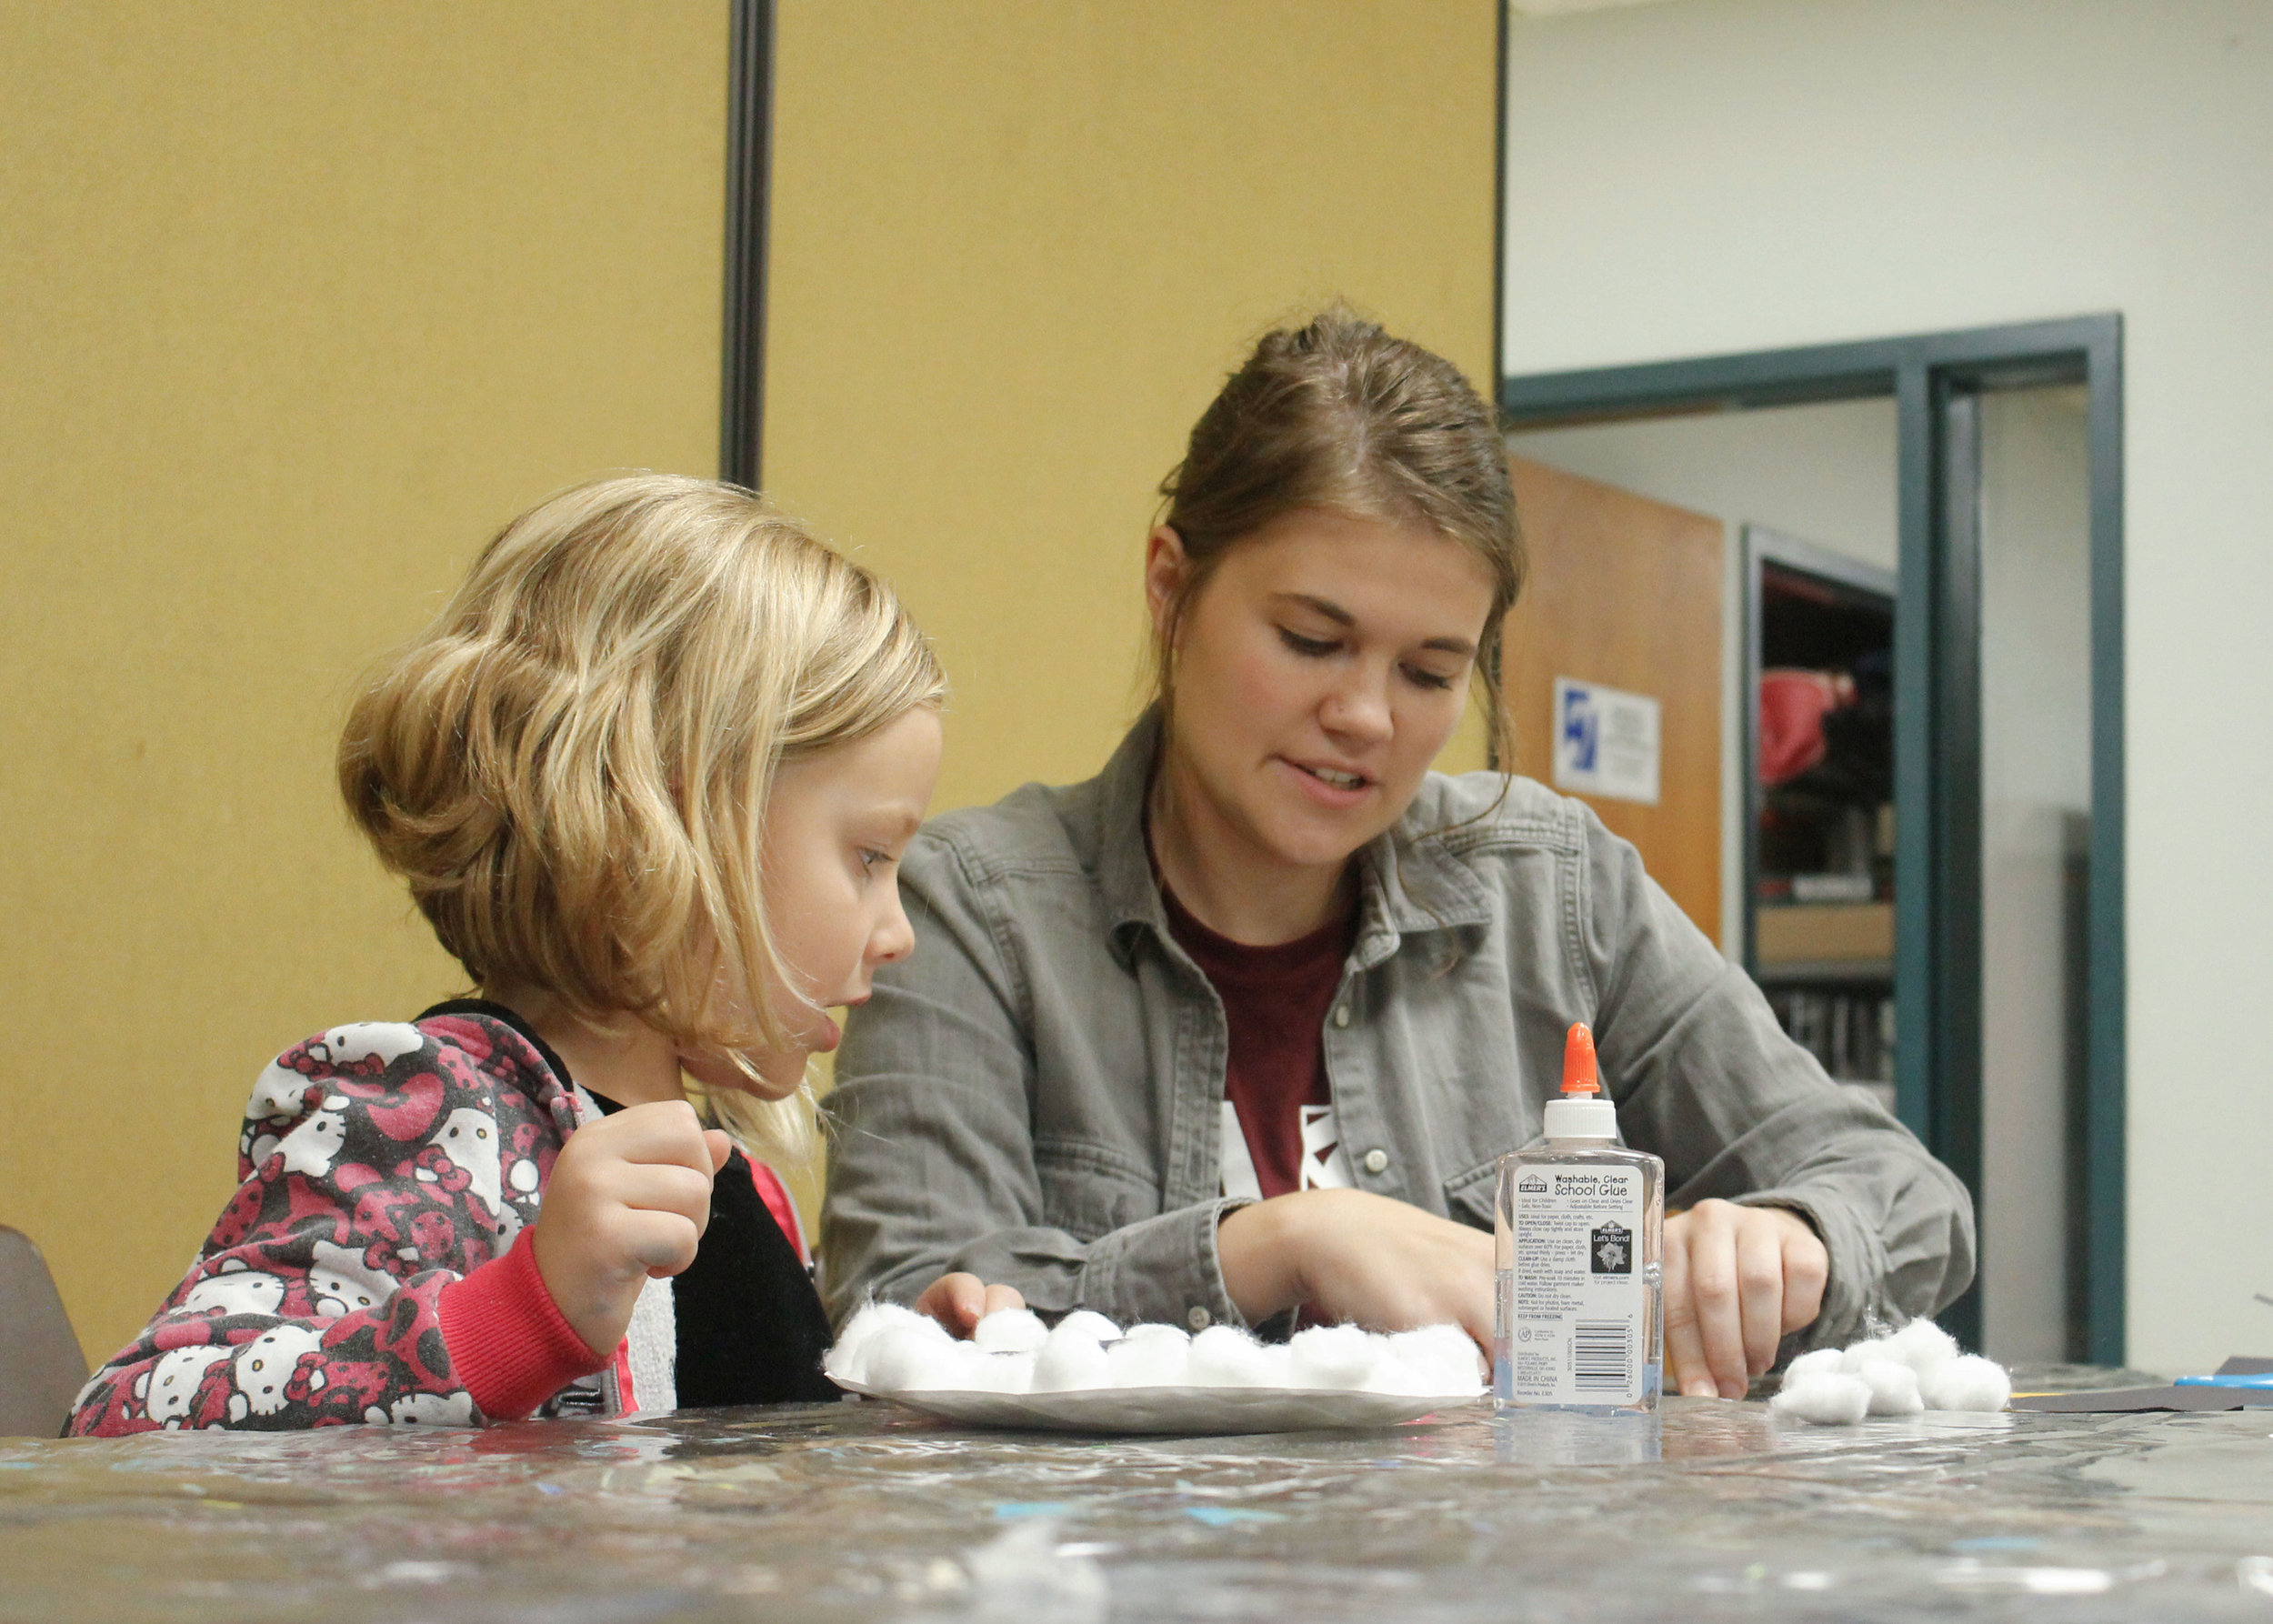 Brittney Hanson  UW-Stout Early Childhood Education INTERNSHIP: Arts and Crafts, Jumpstart After School Program, Menomonie Parks and Recreation